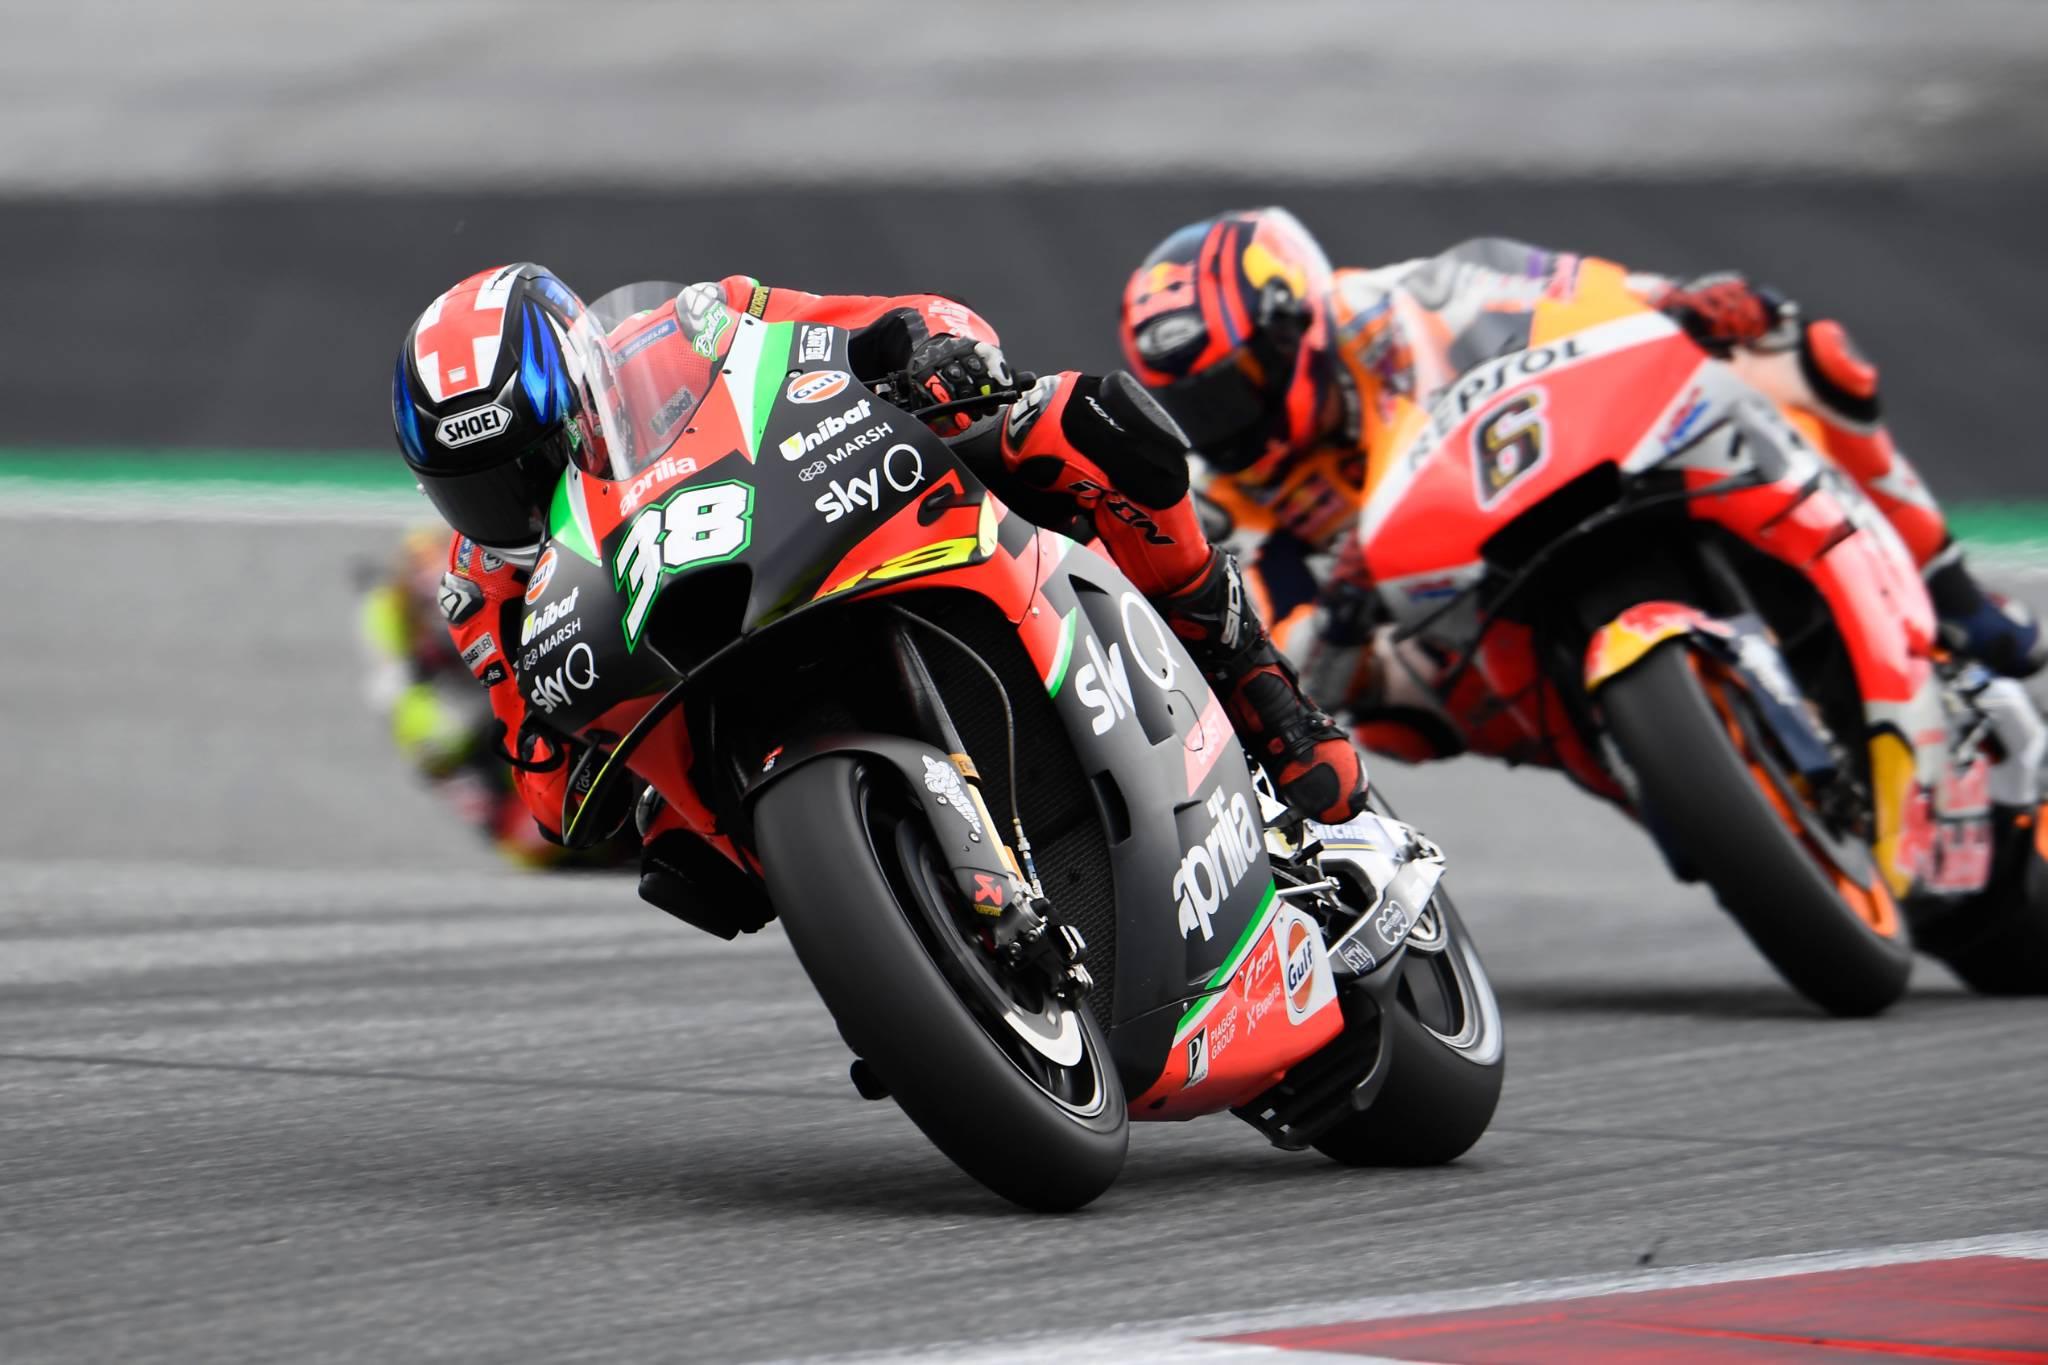 Bradley Smith, Styrian MotoGP race 23 August 2020